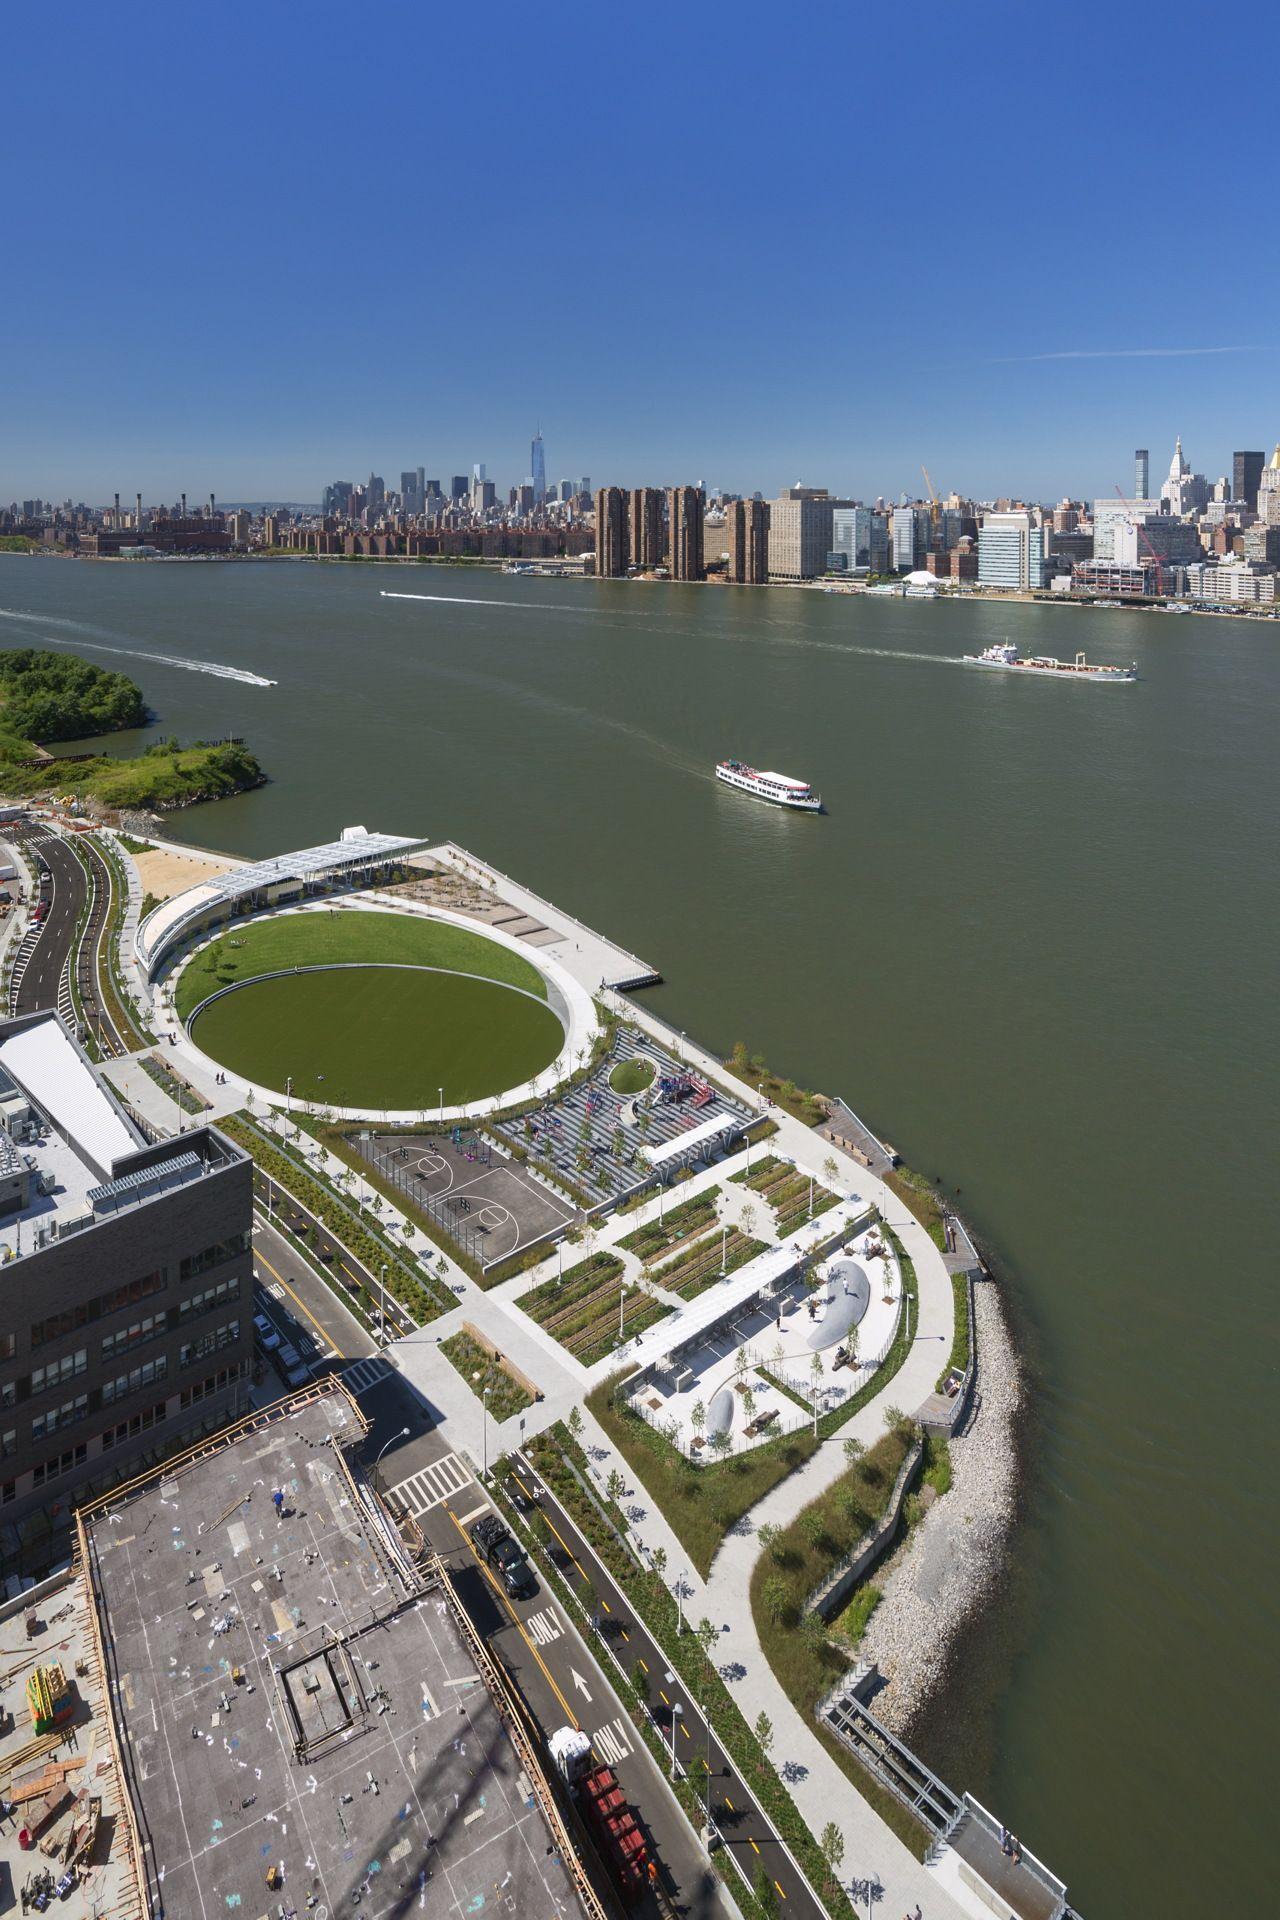 Weiss Manfredi Wins The 2018 National Design Award For Architecture Landscape Plans Long Island City Landscape Architecture